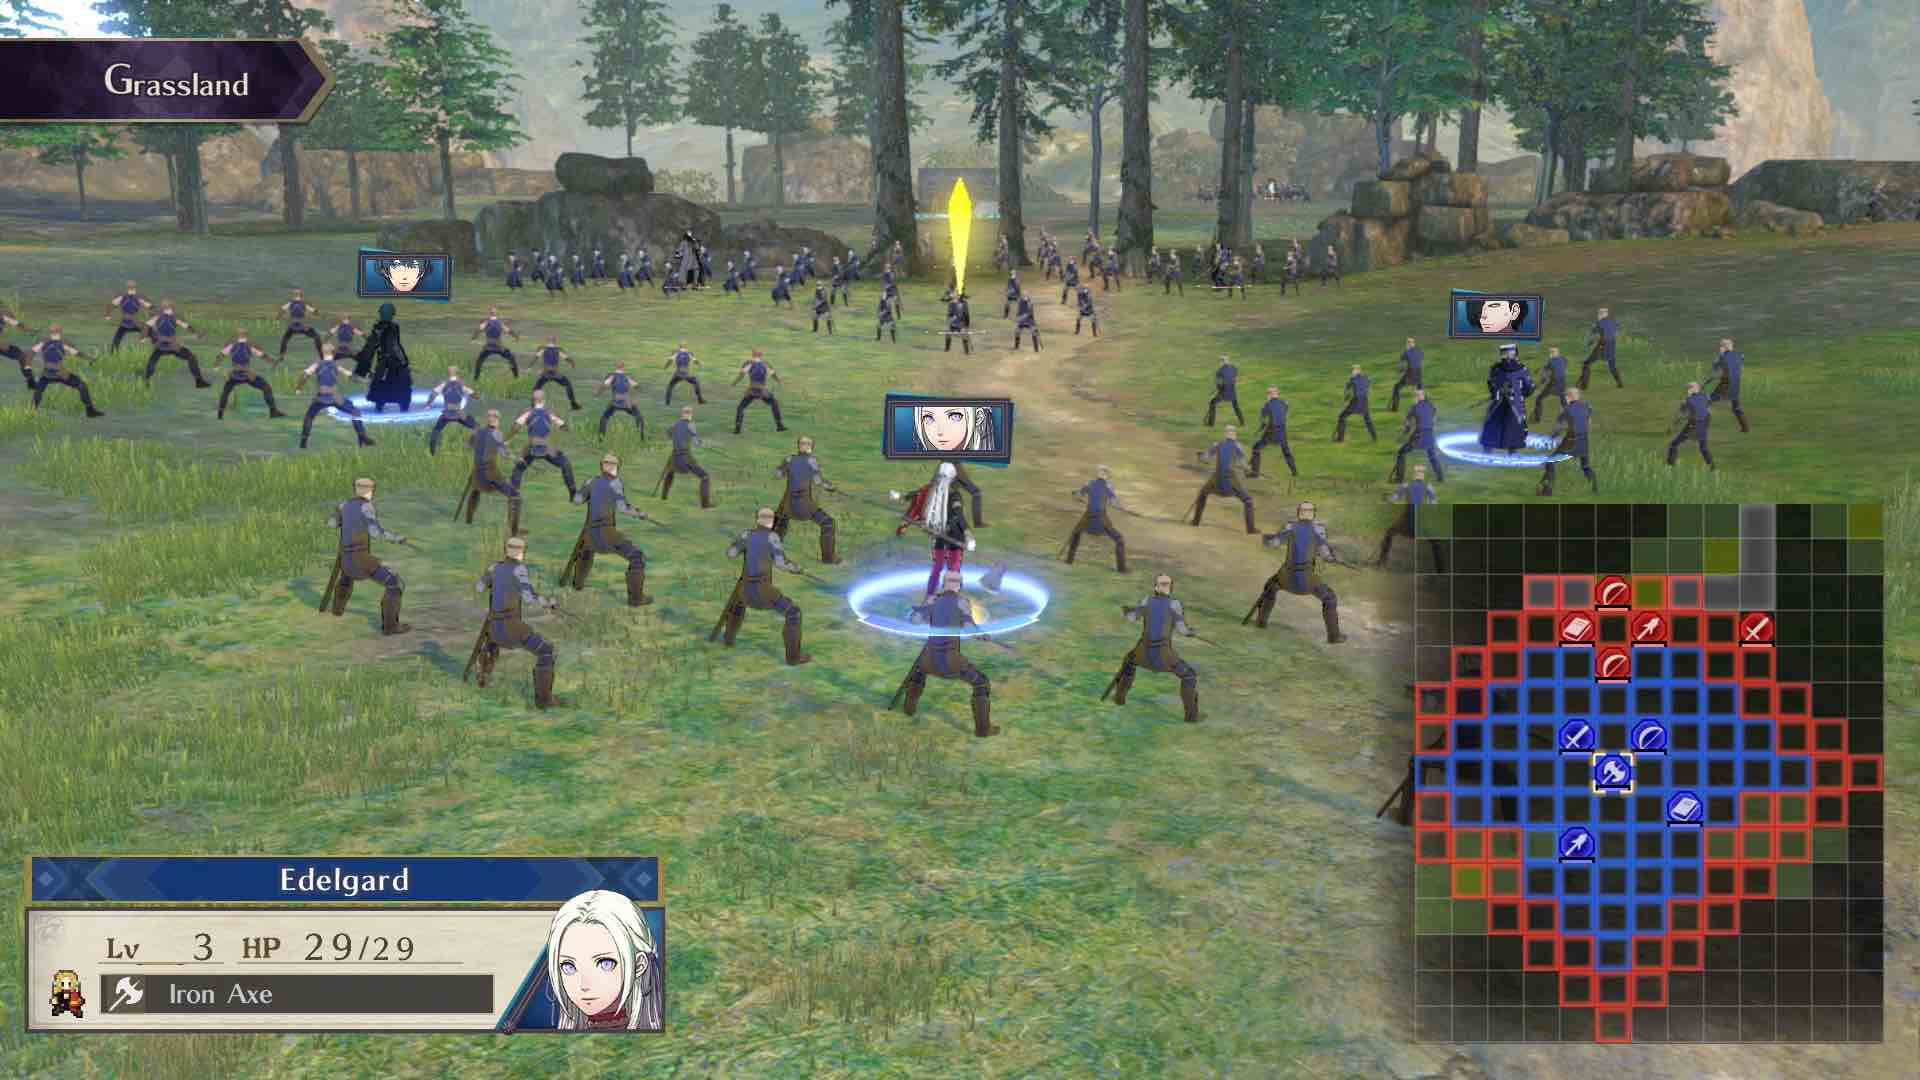 Fire Emblem: Three Houses E3 2018 Screenshot 11